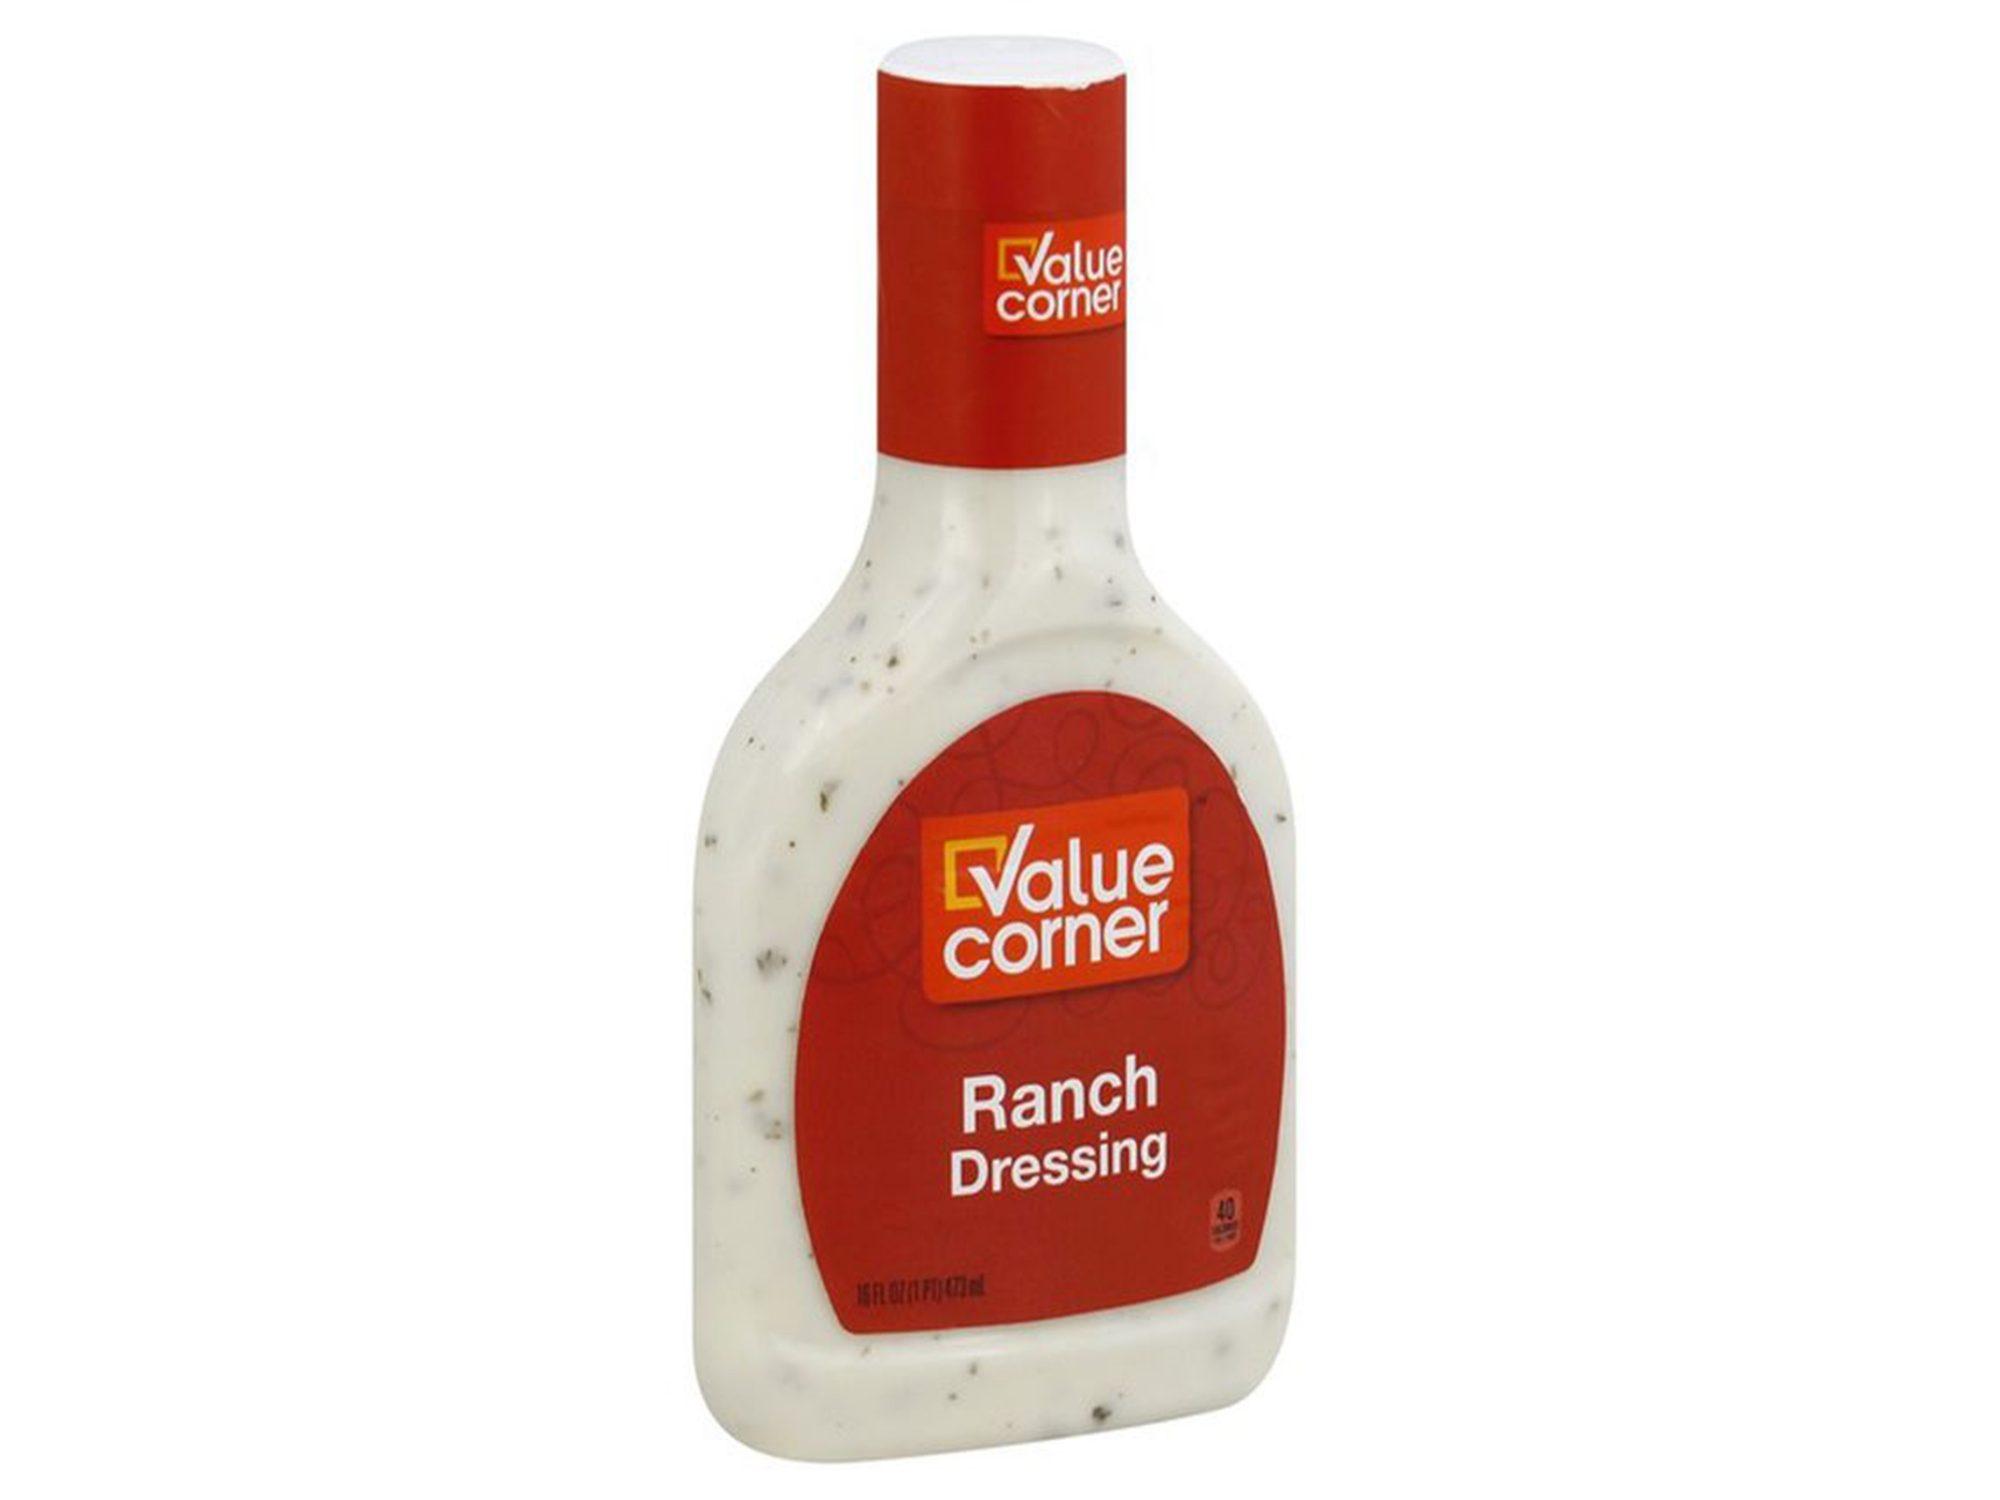 value-corner-ranch copy.jpg